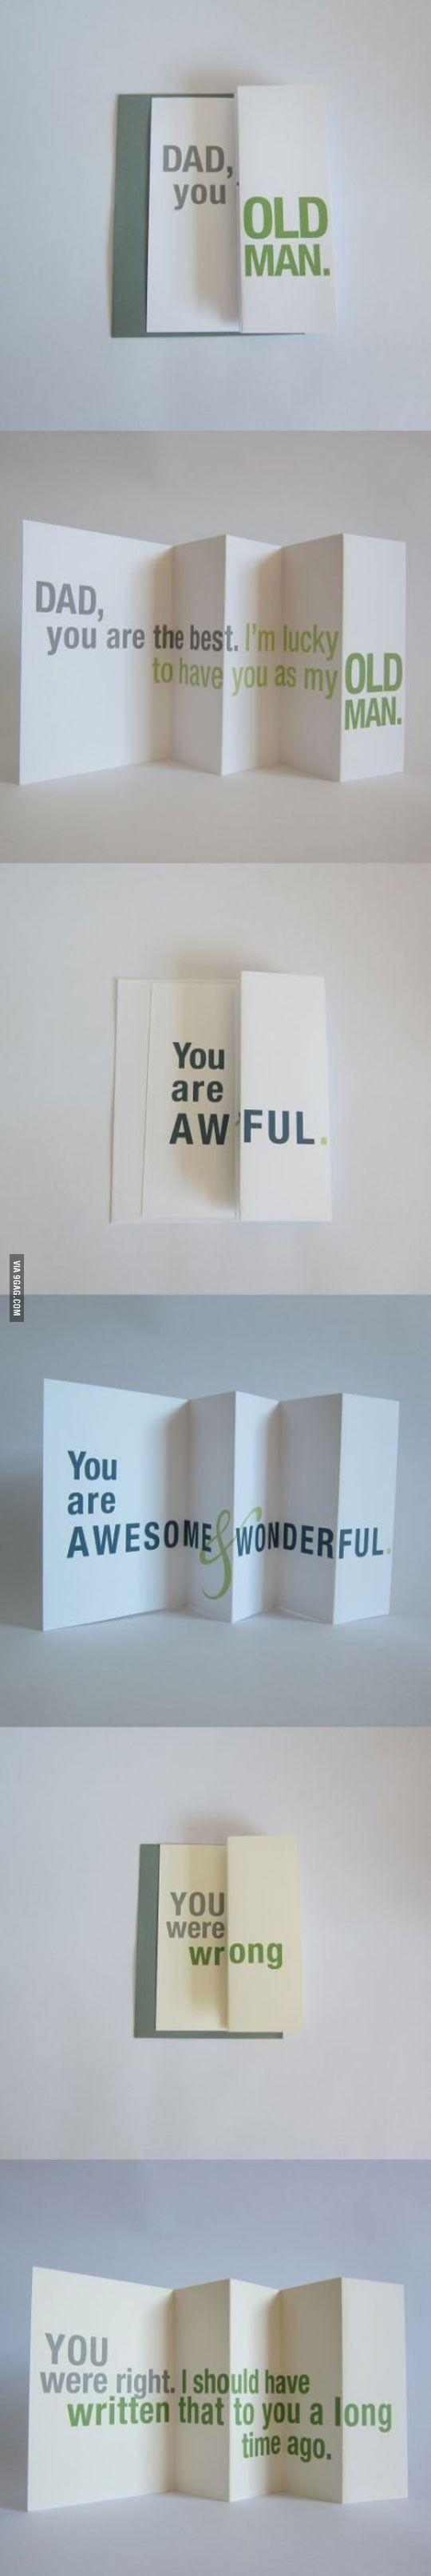 Preceptive cards